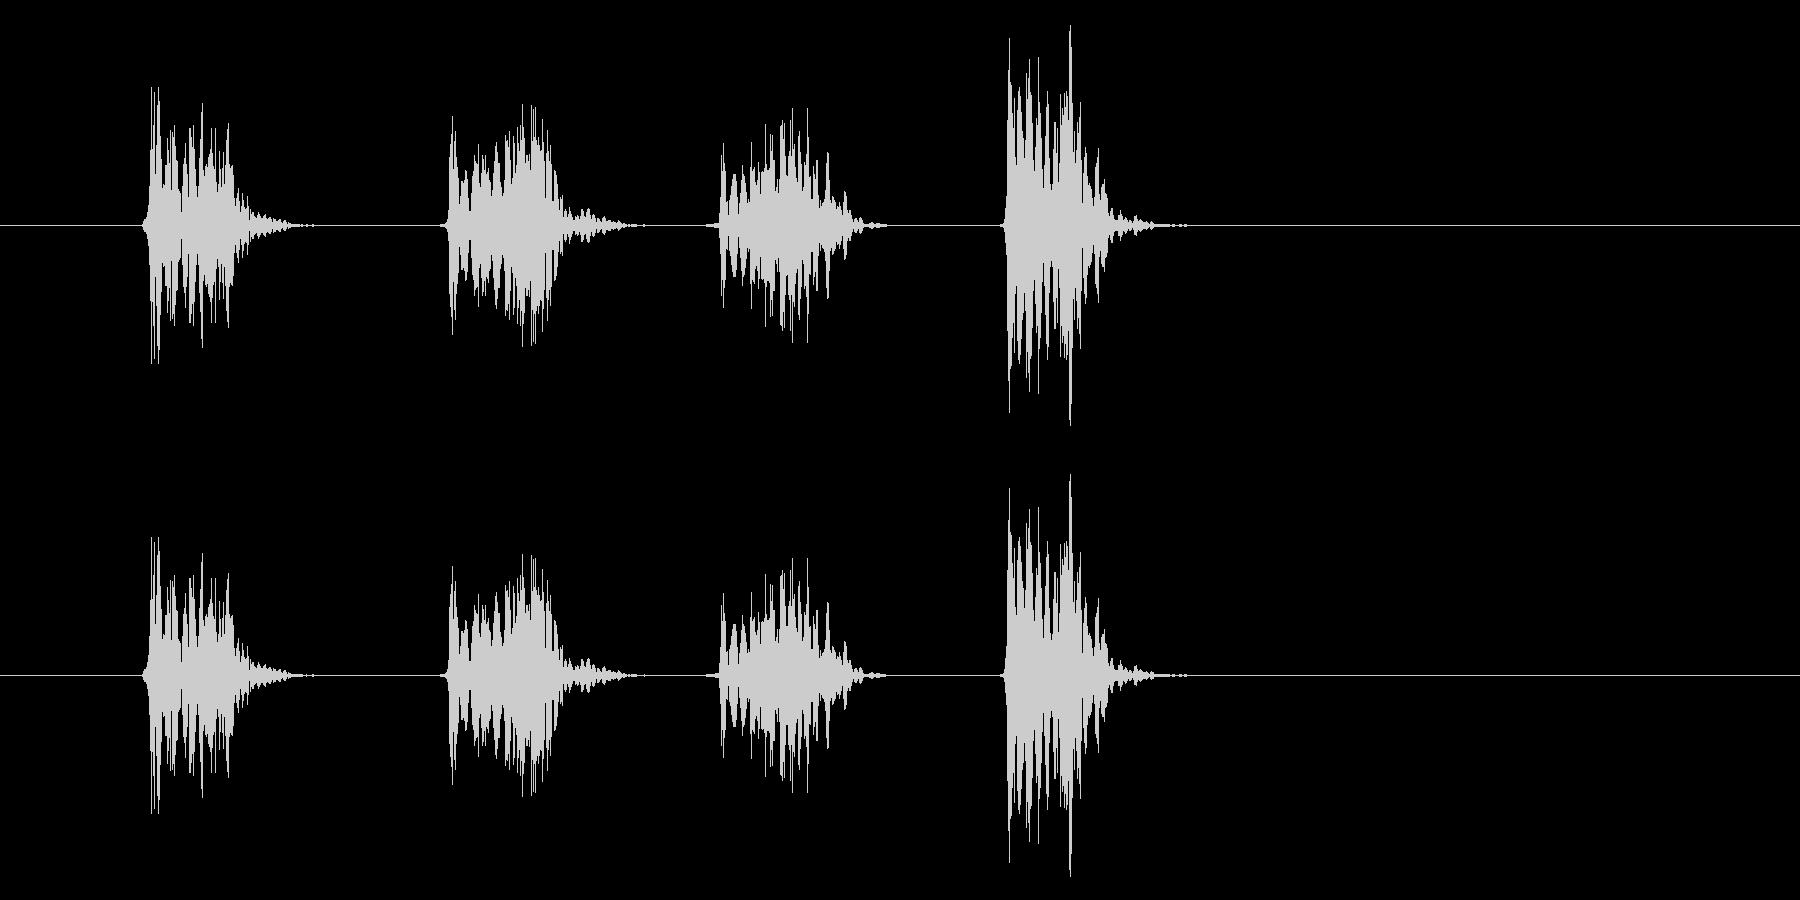 PC マウス02-19(スクロール 速)の未再生の波形